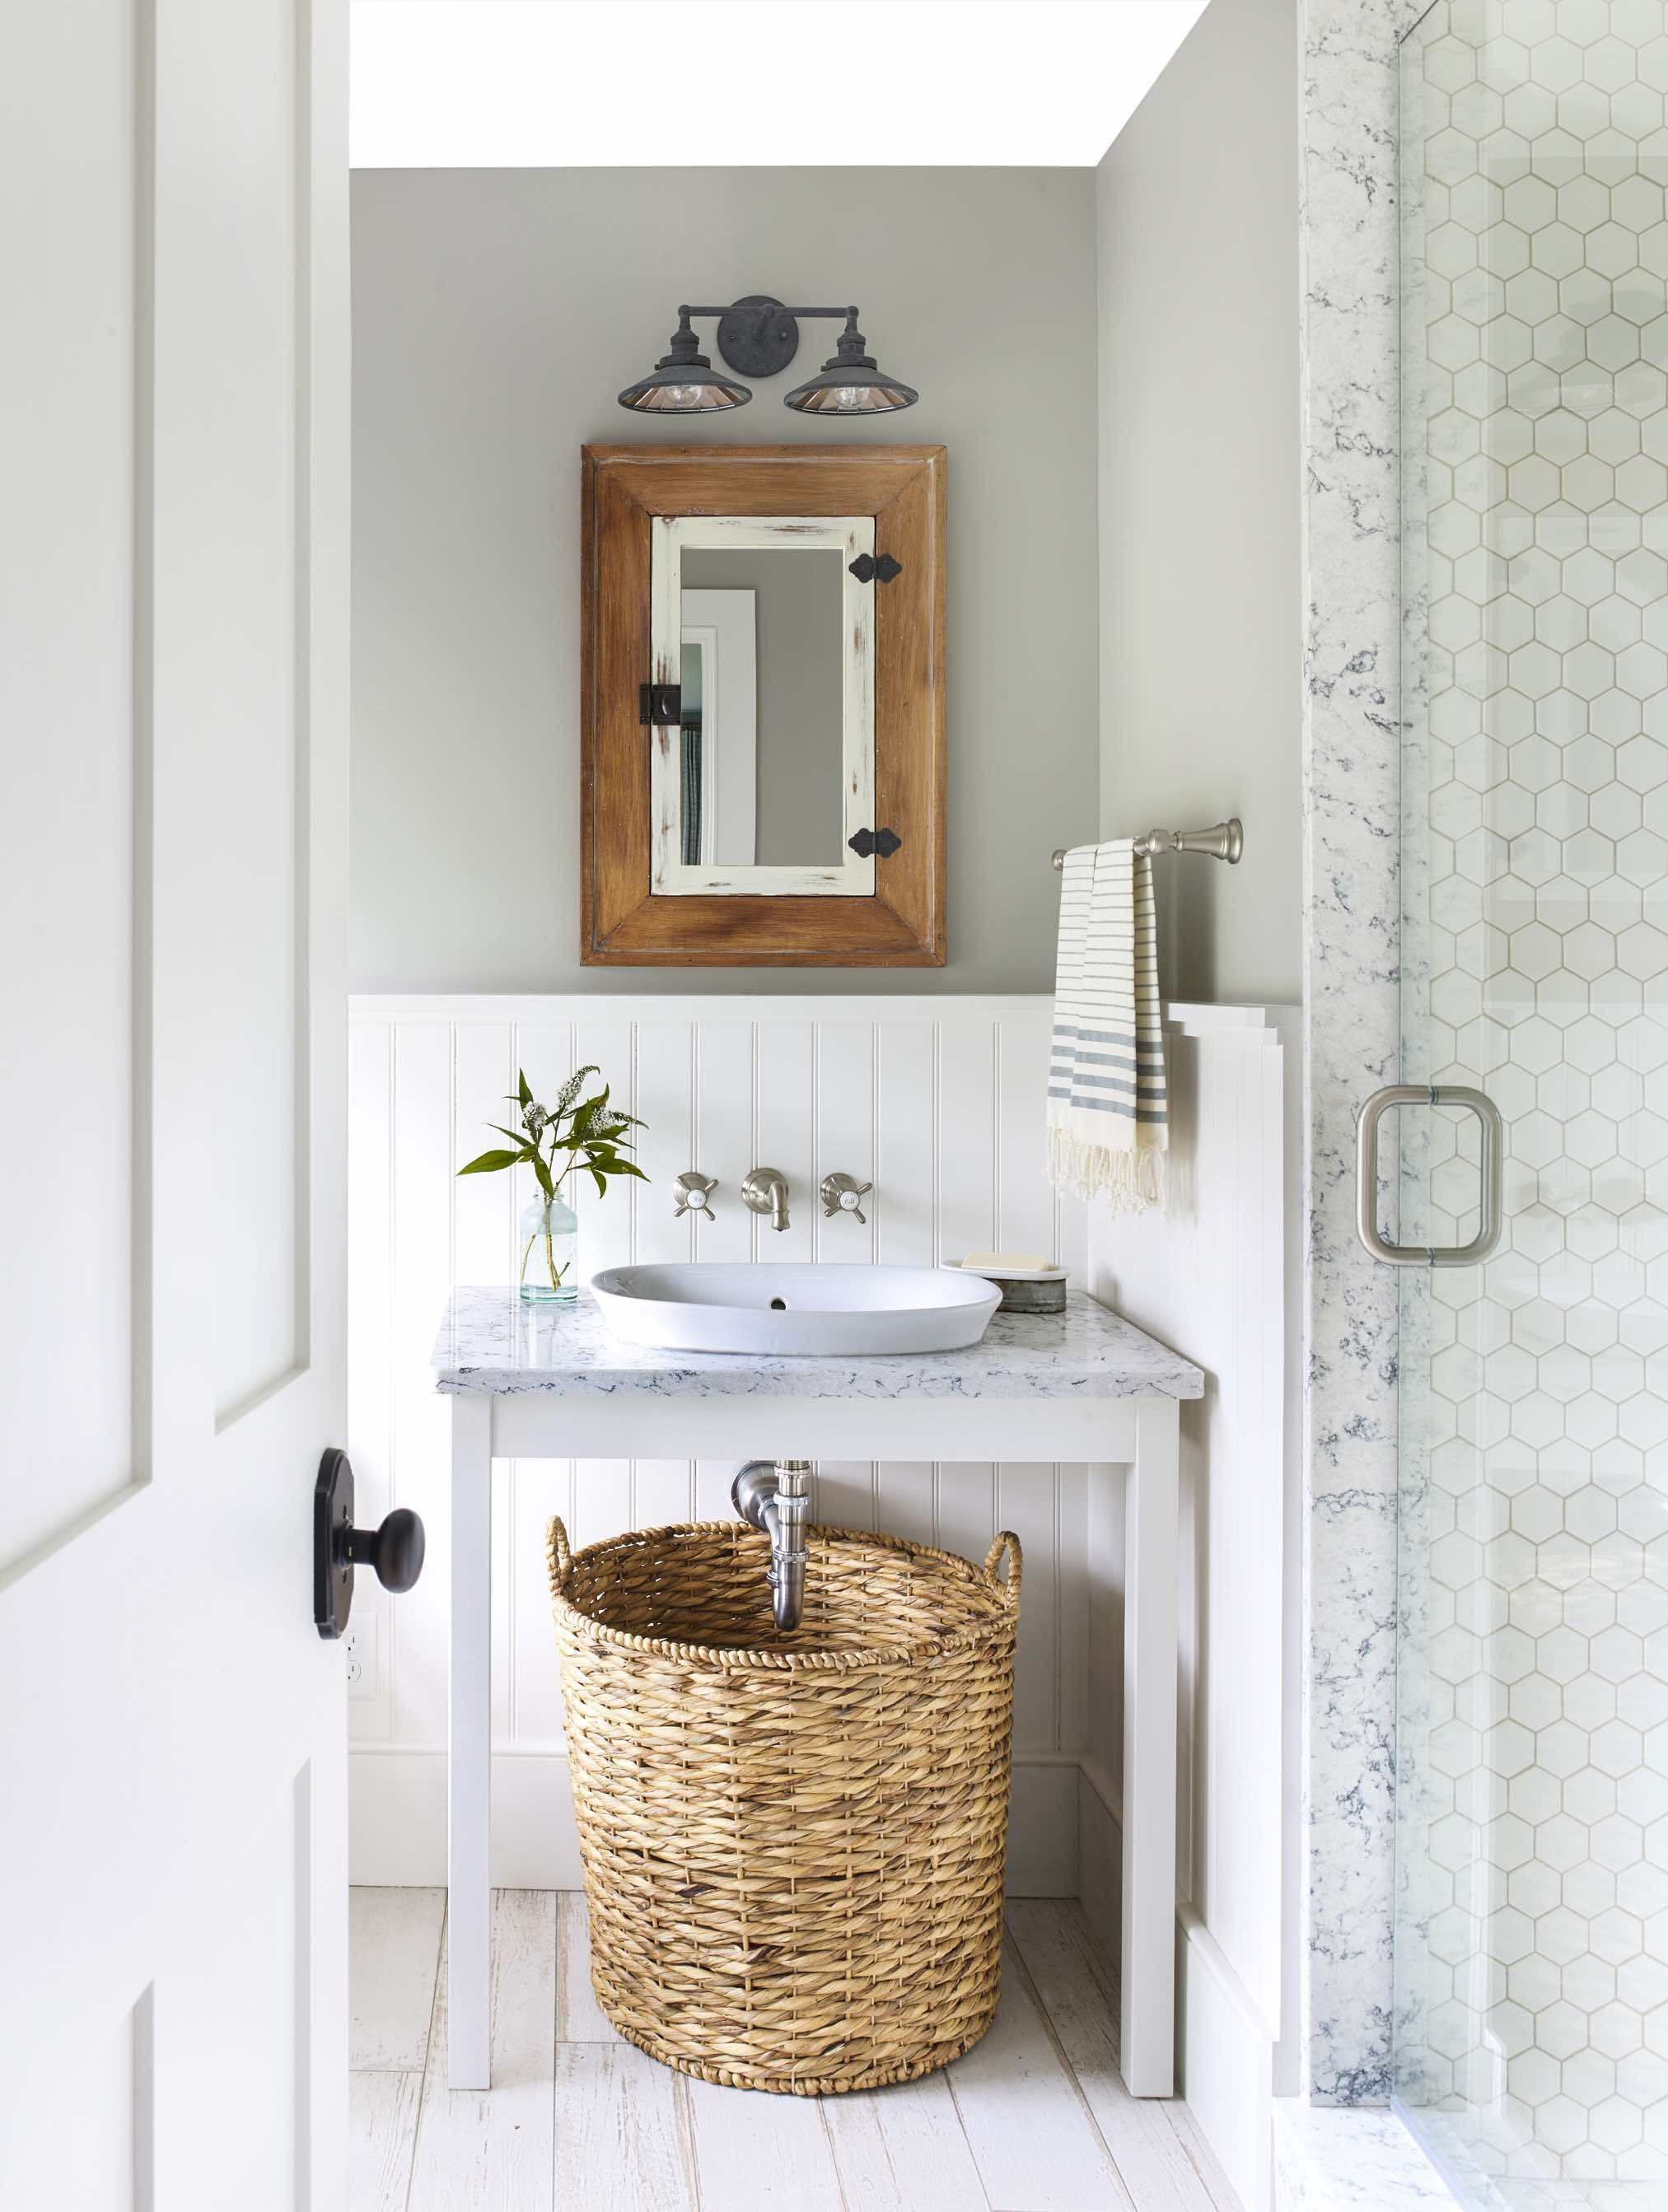 25 Best Bathroom Paint Colors Popular, Small Bathroom Paint Color Ideas 2021